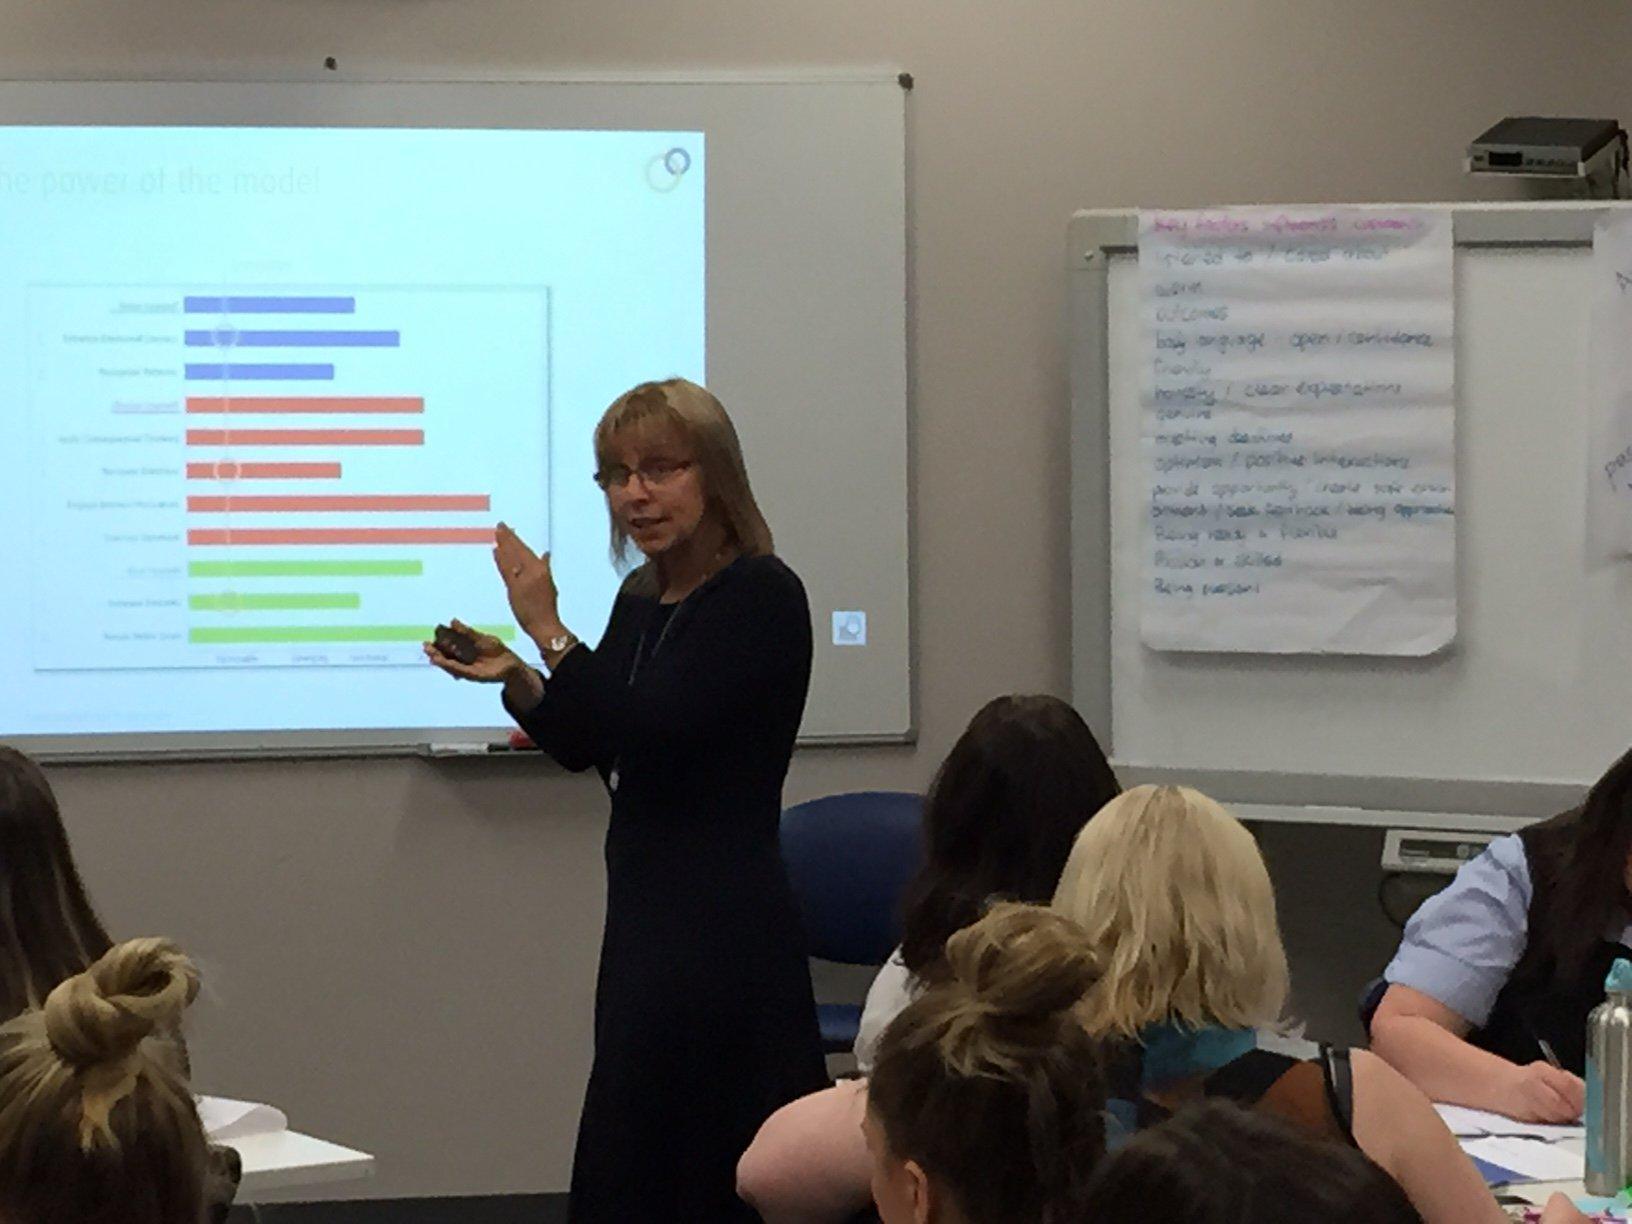 Australia's Careerlink: People Solutions Drive Performance